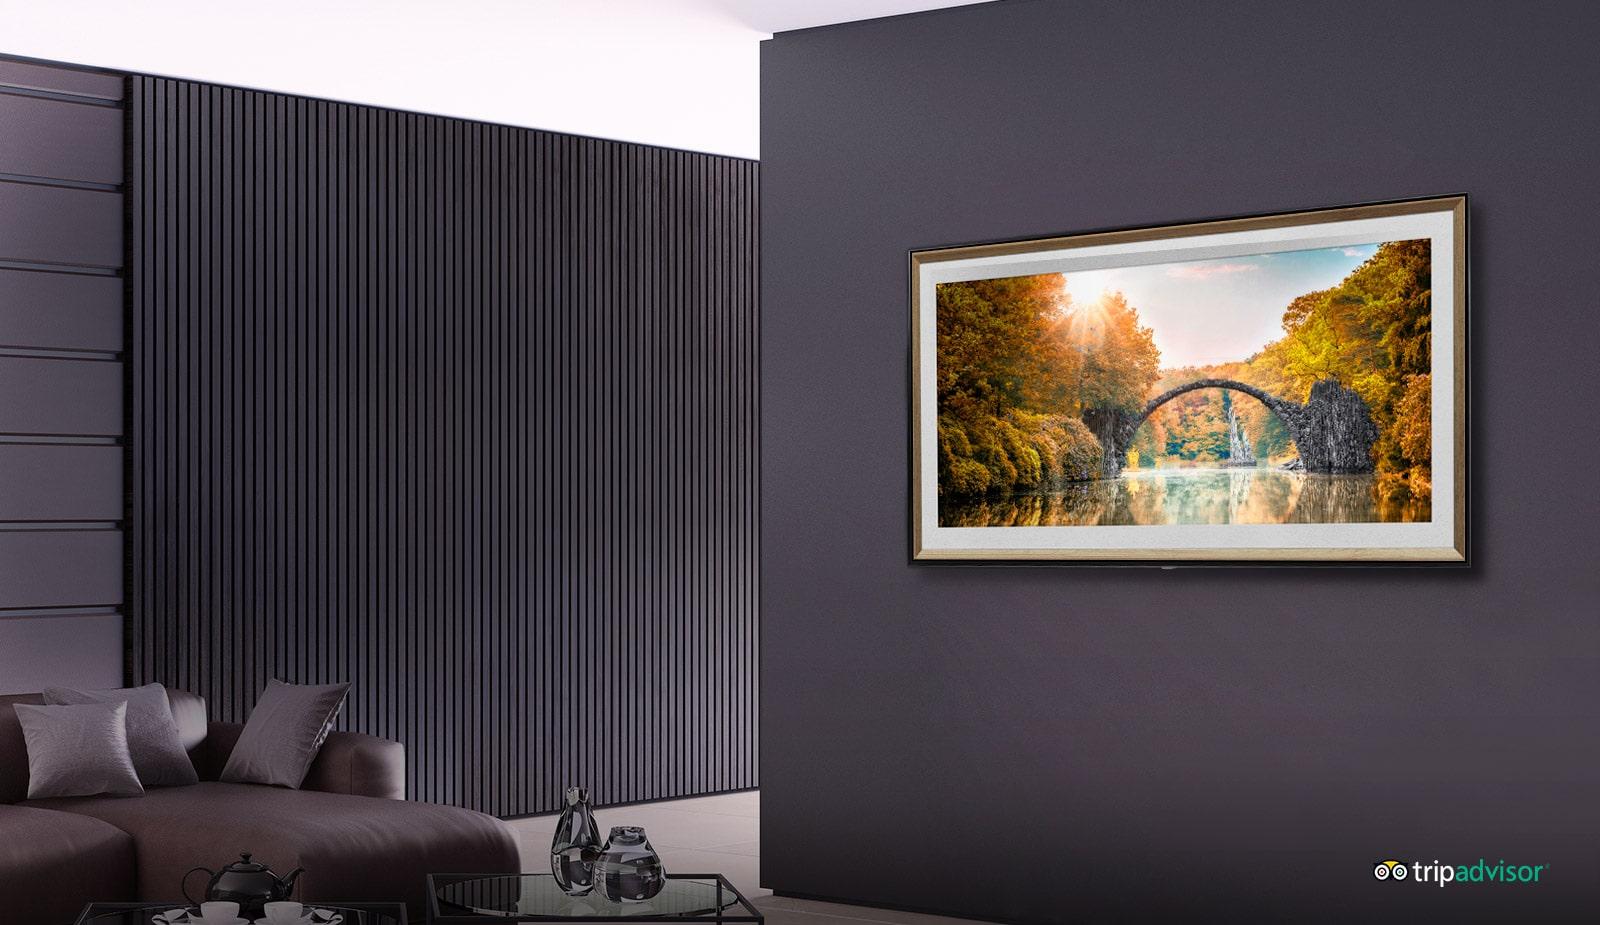 TV-NanoCell-SM86-10-Gallery-Mode-Desktop